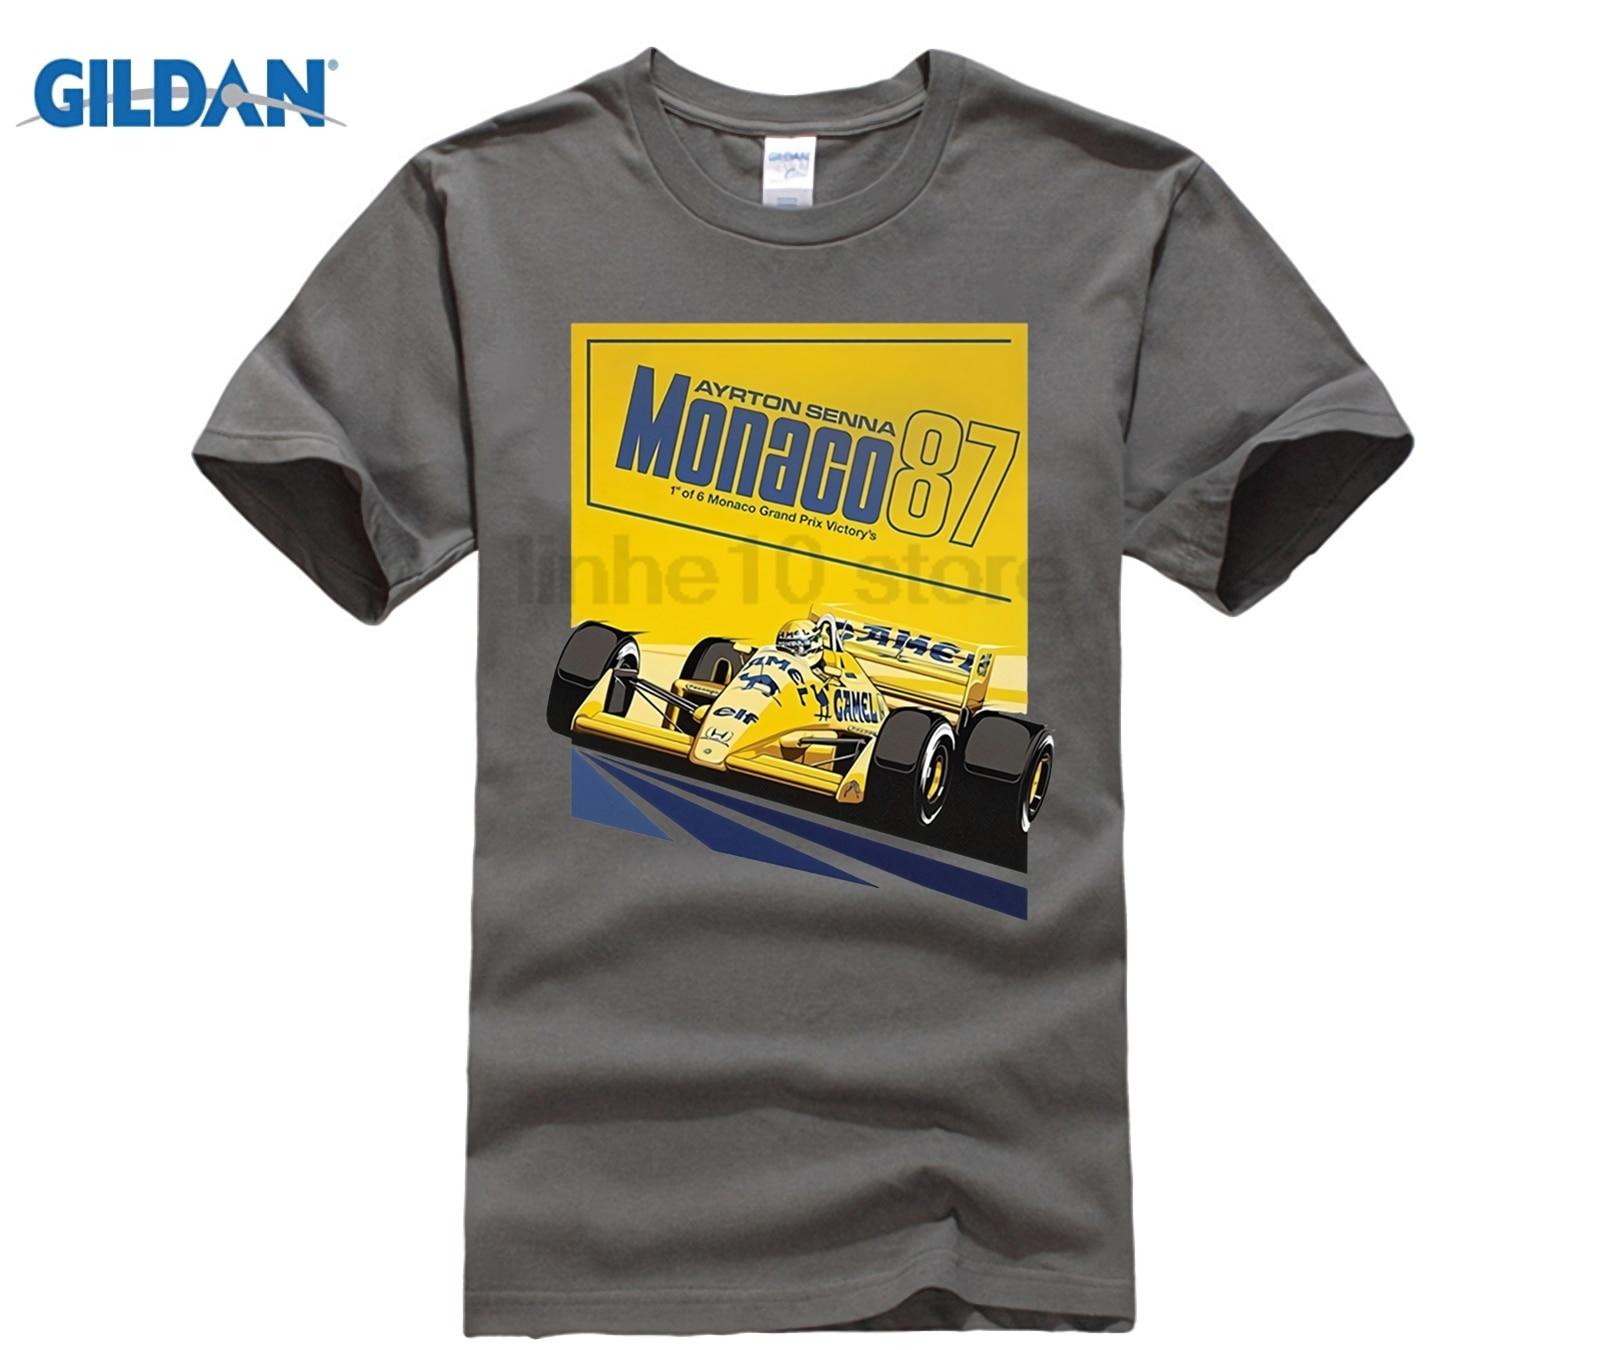 Neue Ankunft Ayrton Senna 87 Poster Tops T Shirt 1 Auto Männer Runde Kragen Kurzarm T-Shirts